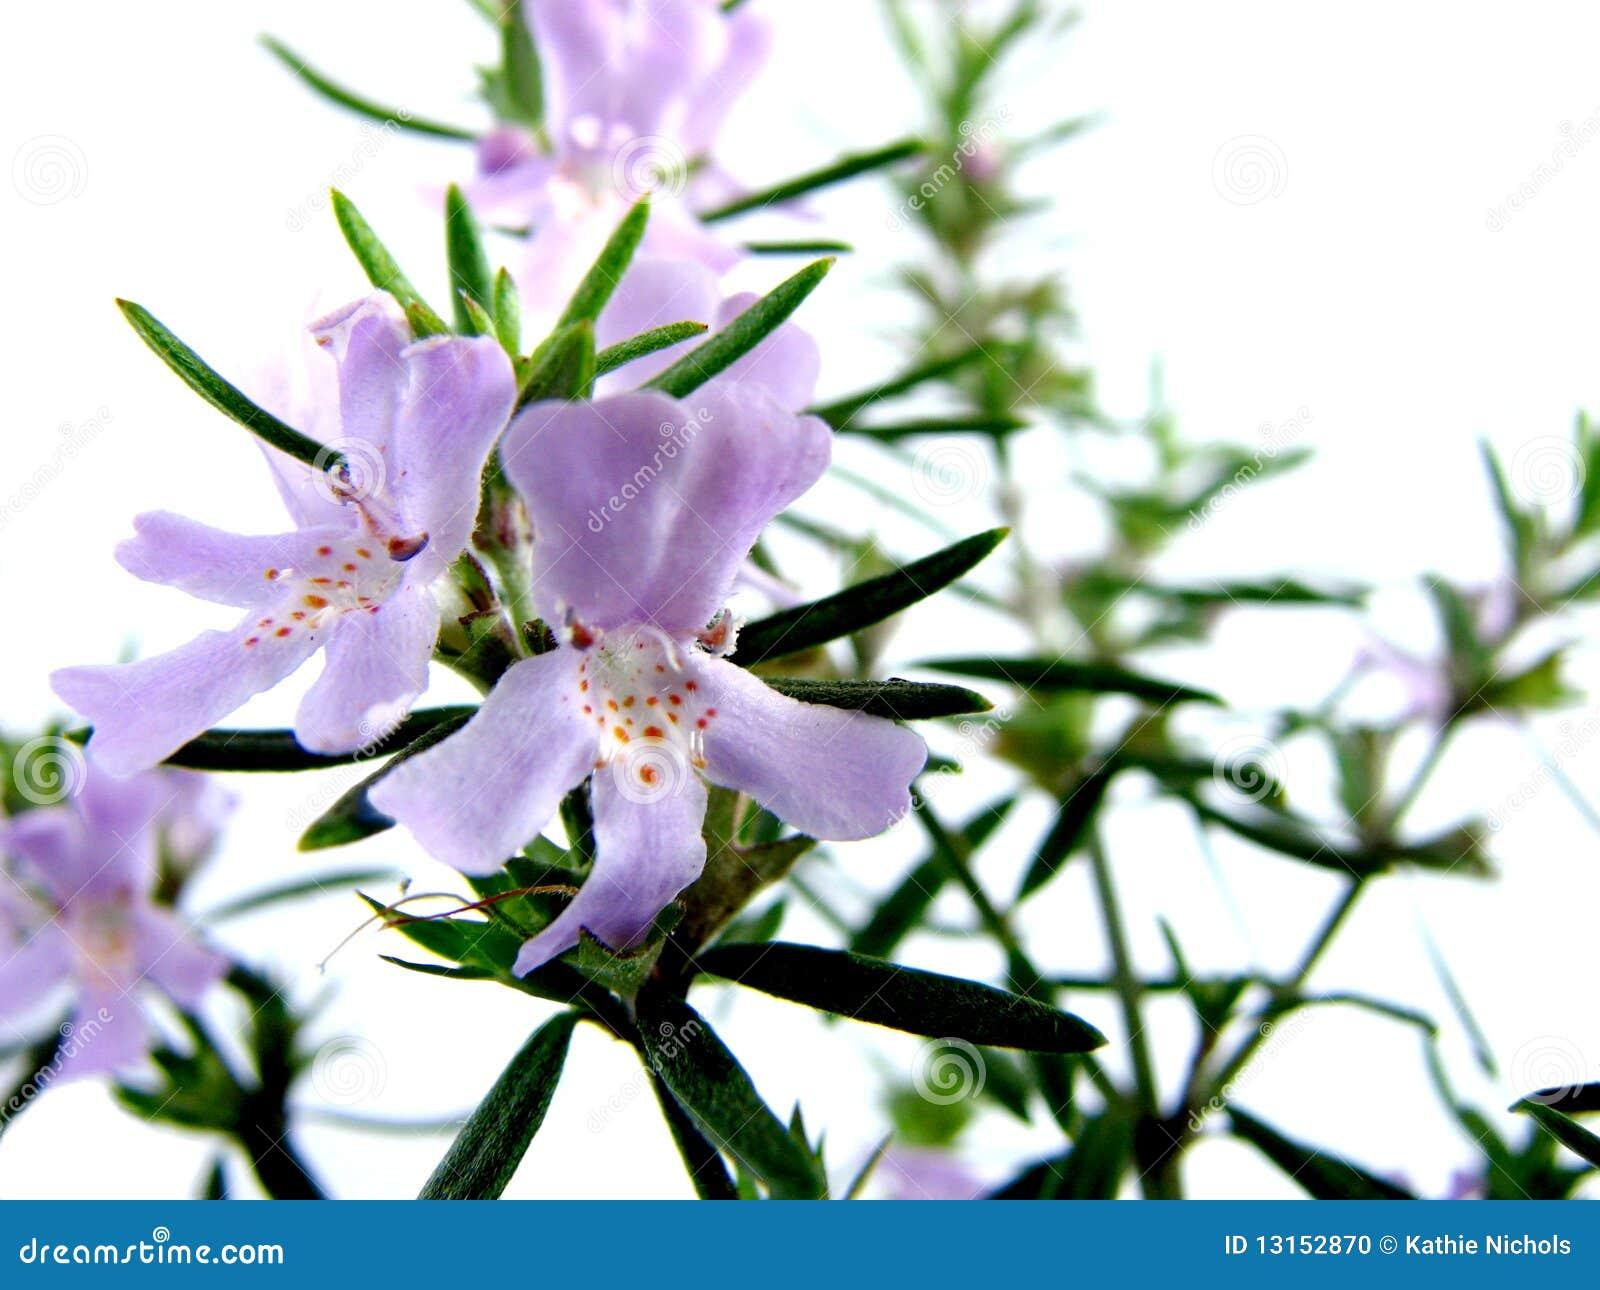 Bush Rosemary Flowers Stock Photo Image 13152870